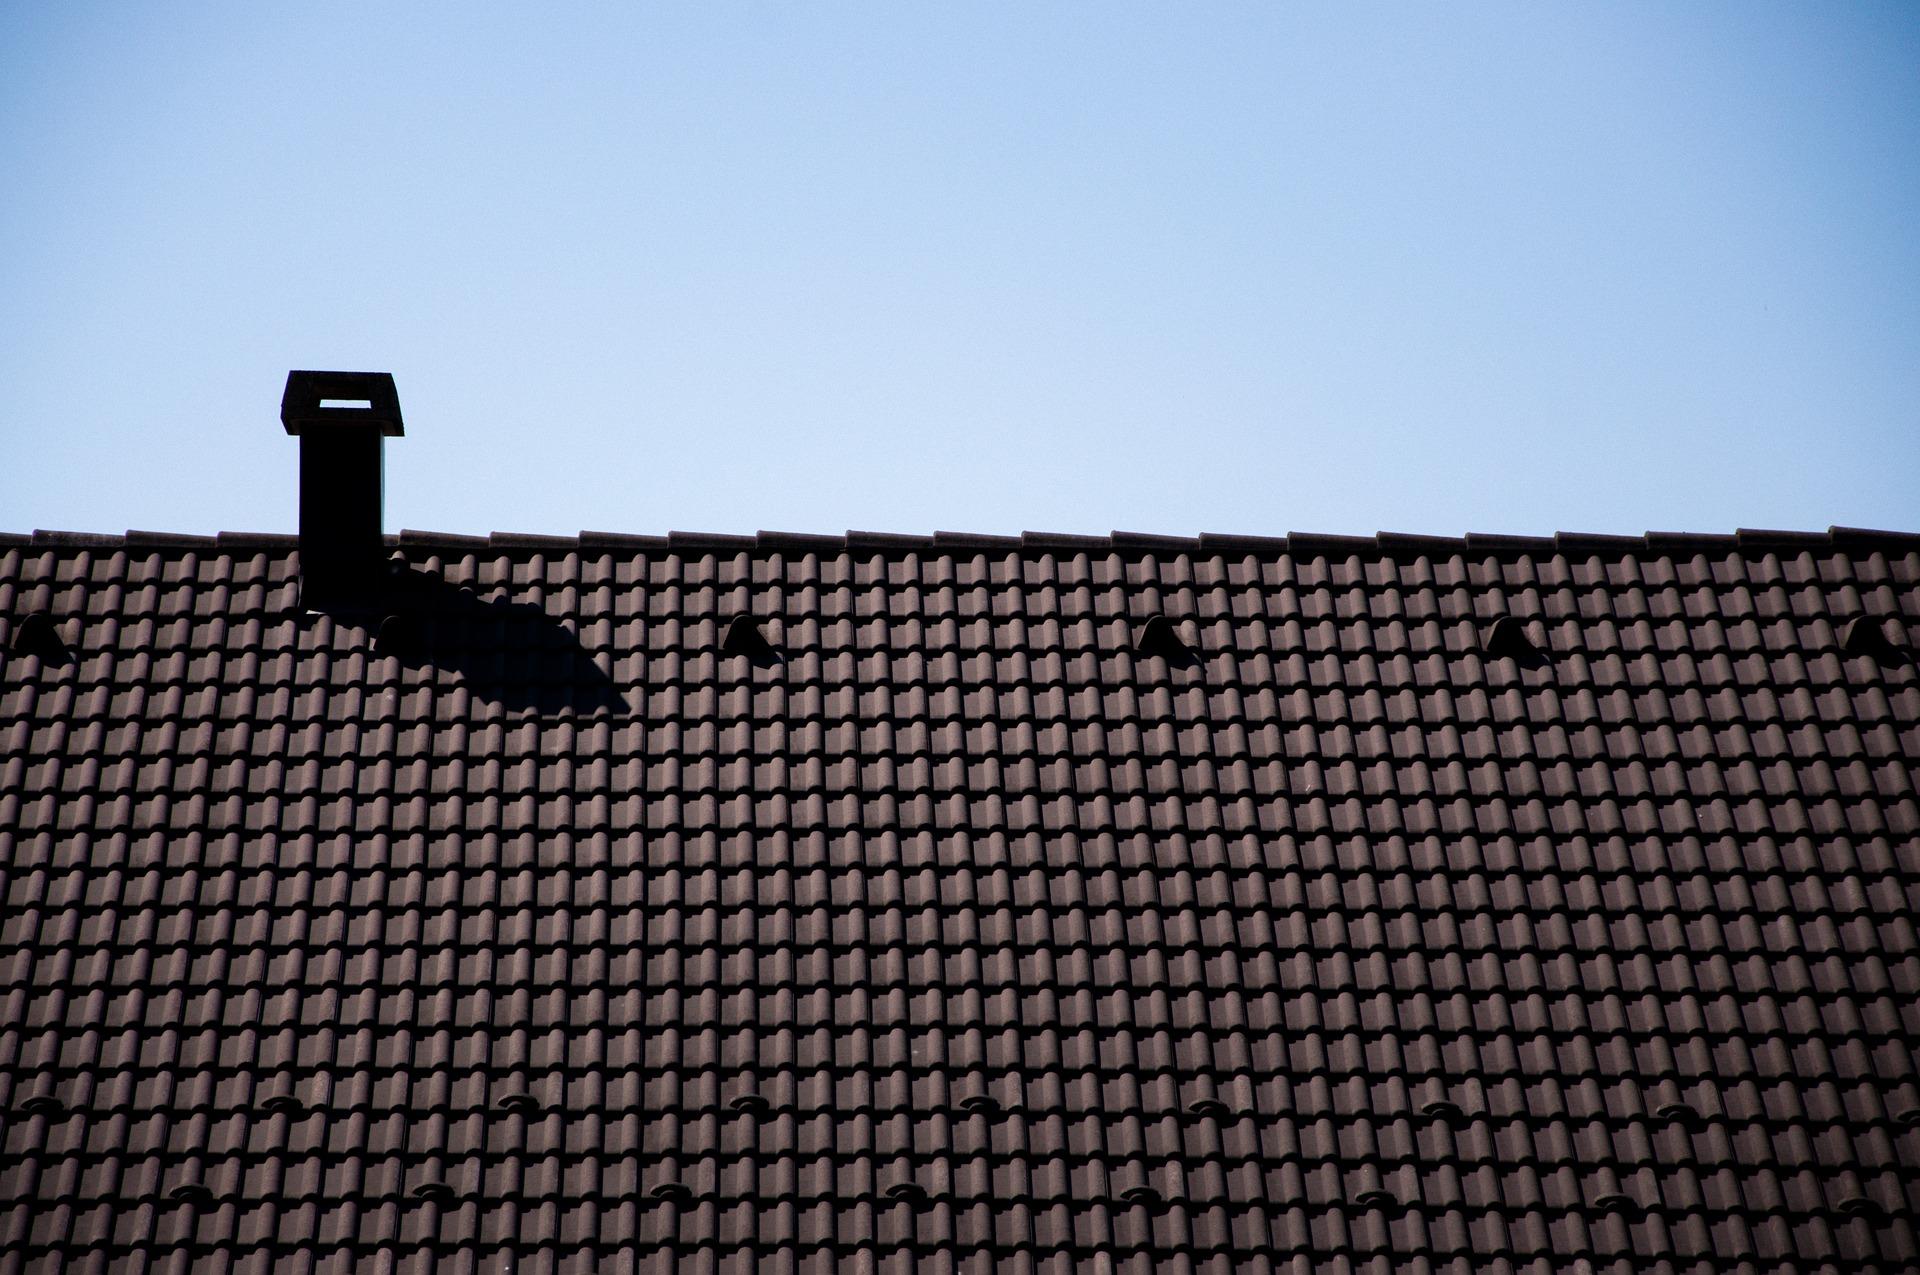 roof-5112517_1920.jpg